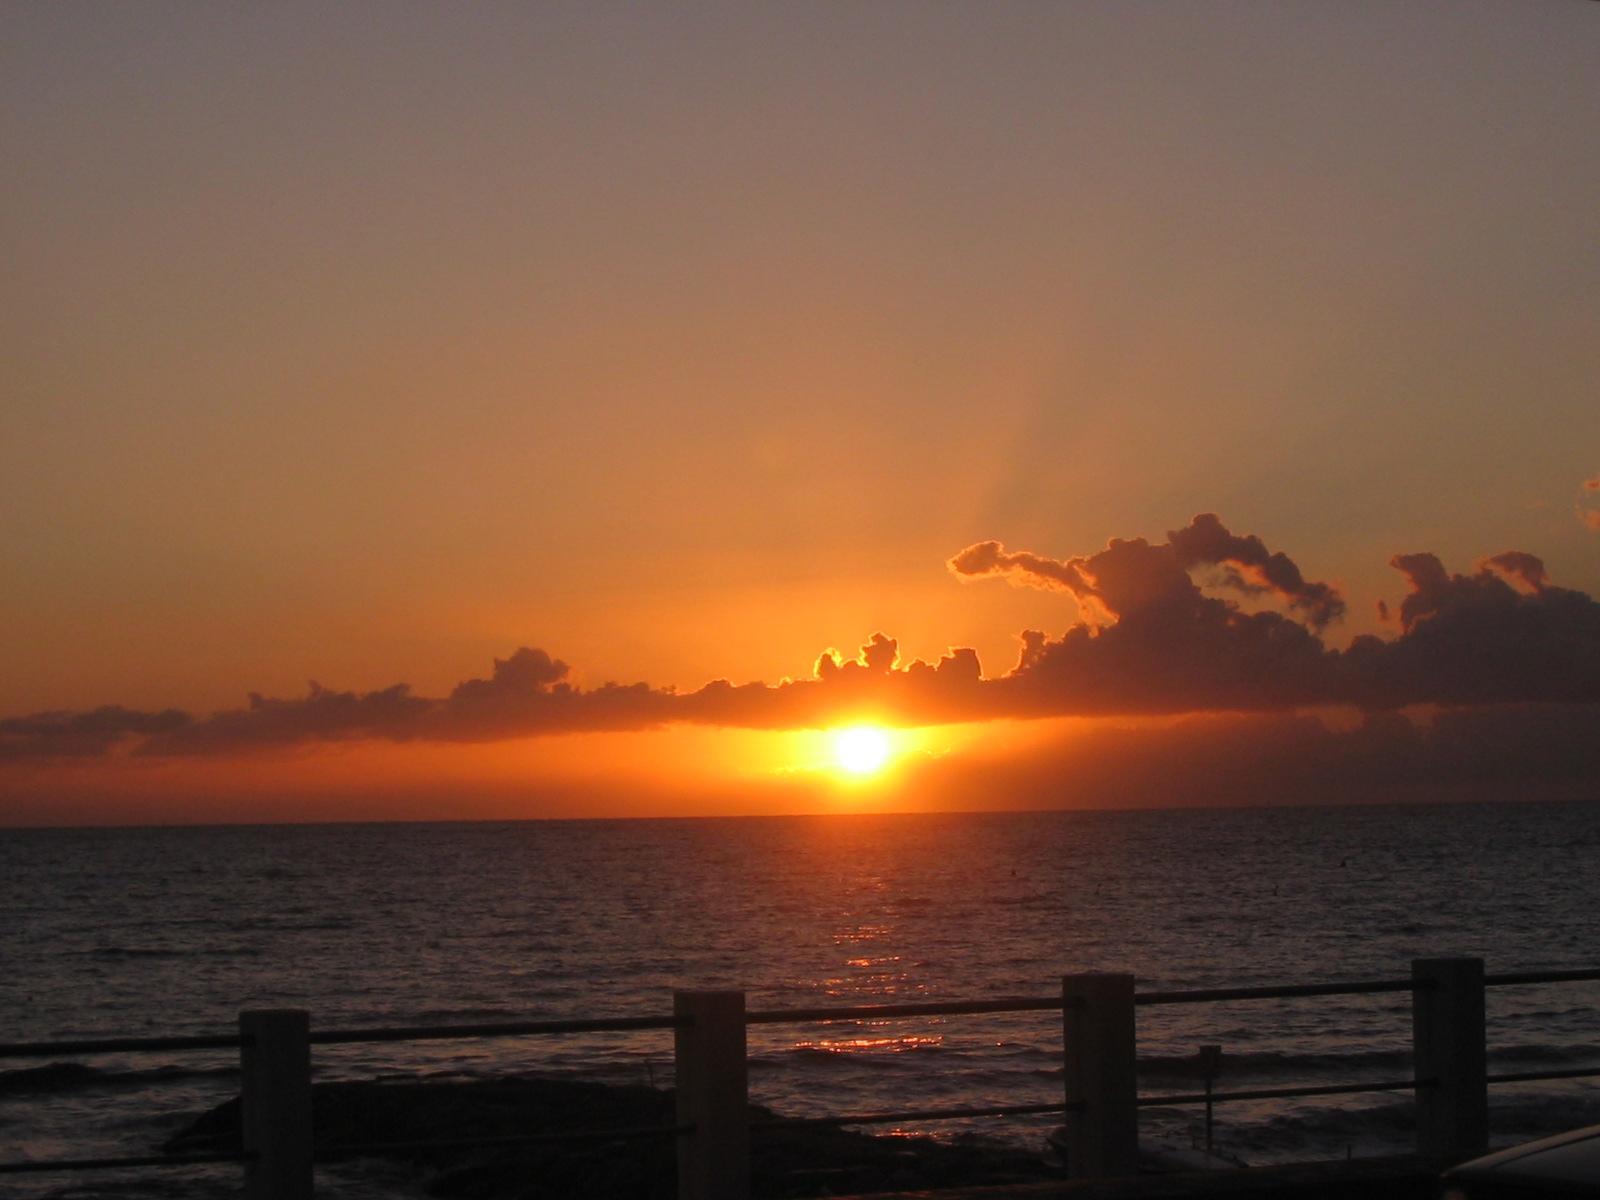 [FOTOGRAFIA] – Il sole sorge a Laigueglia